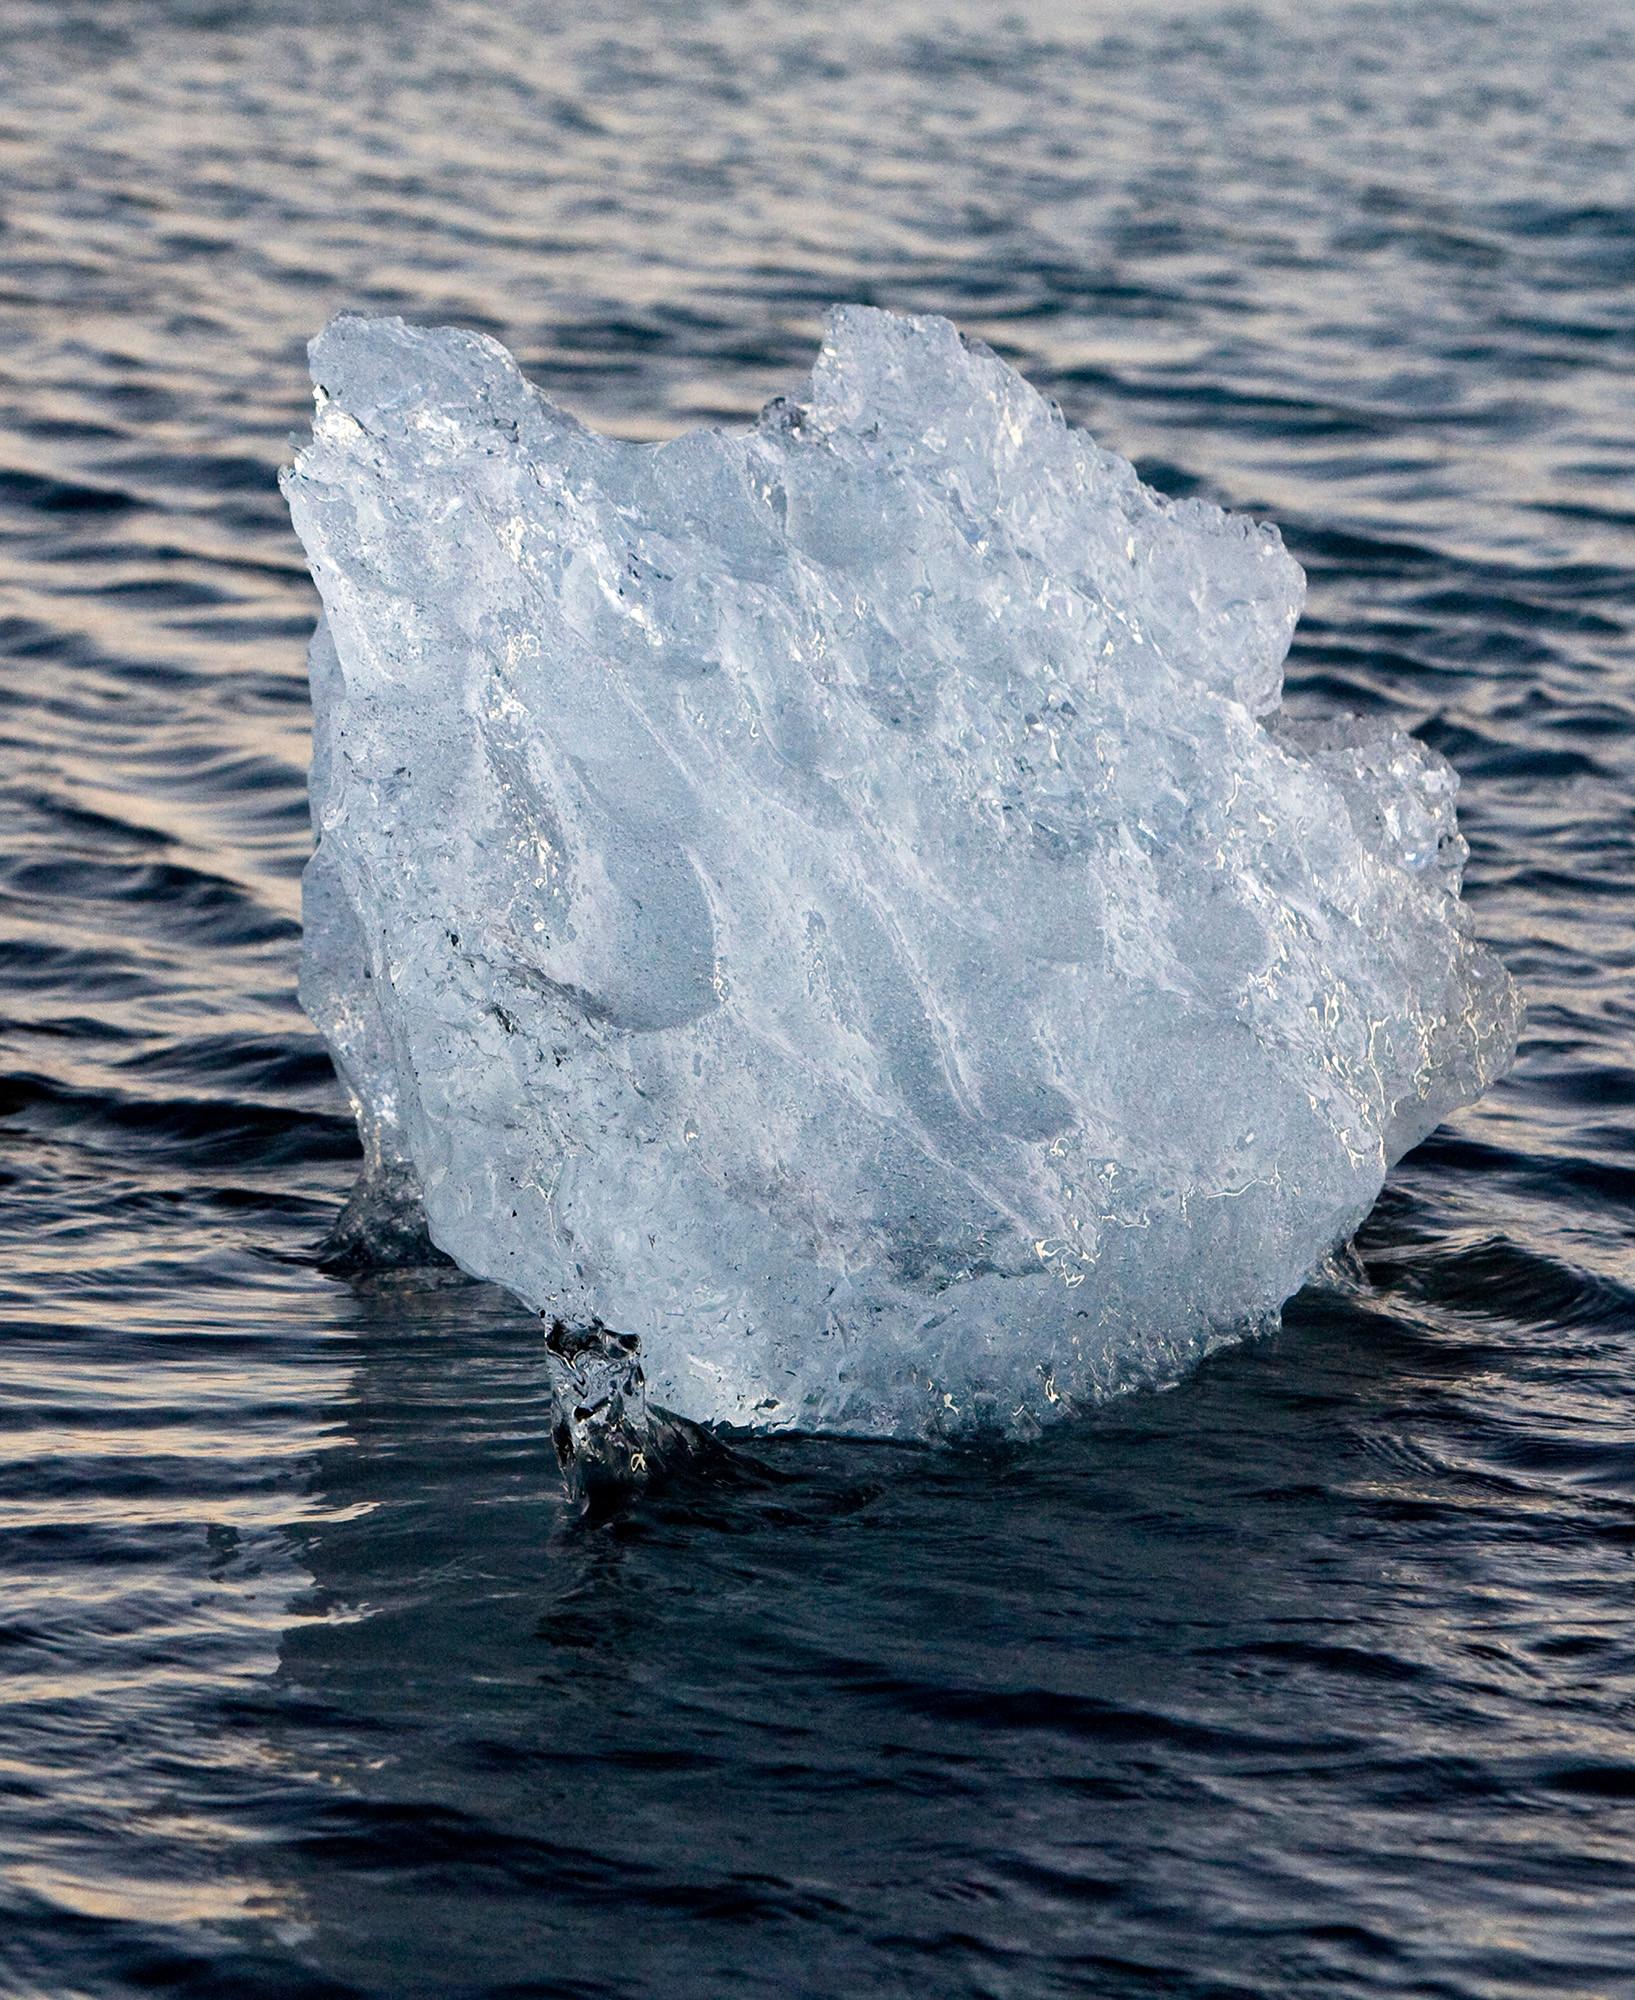 Ice shard, Jokusarlon